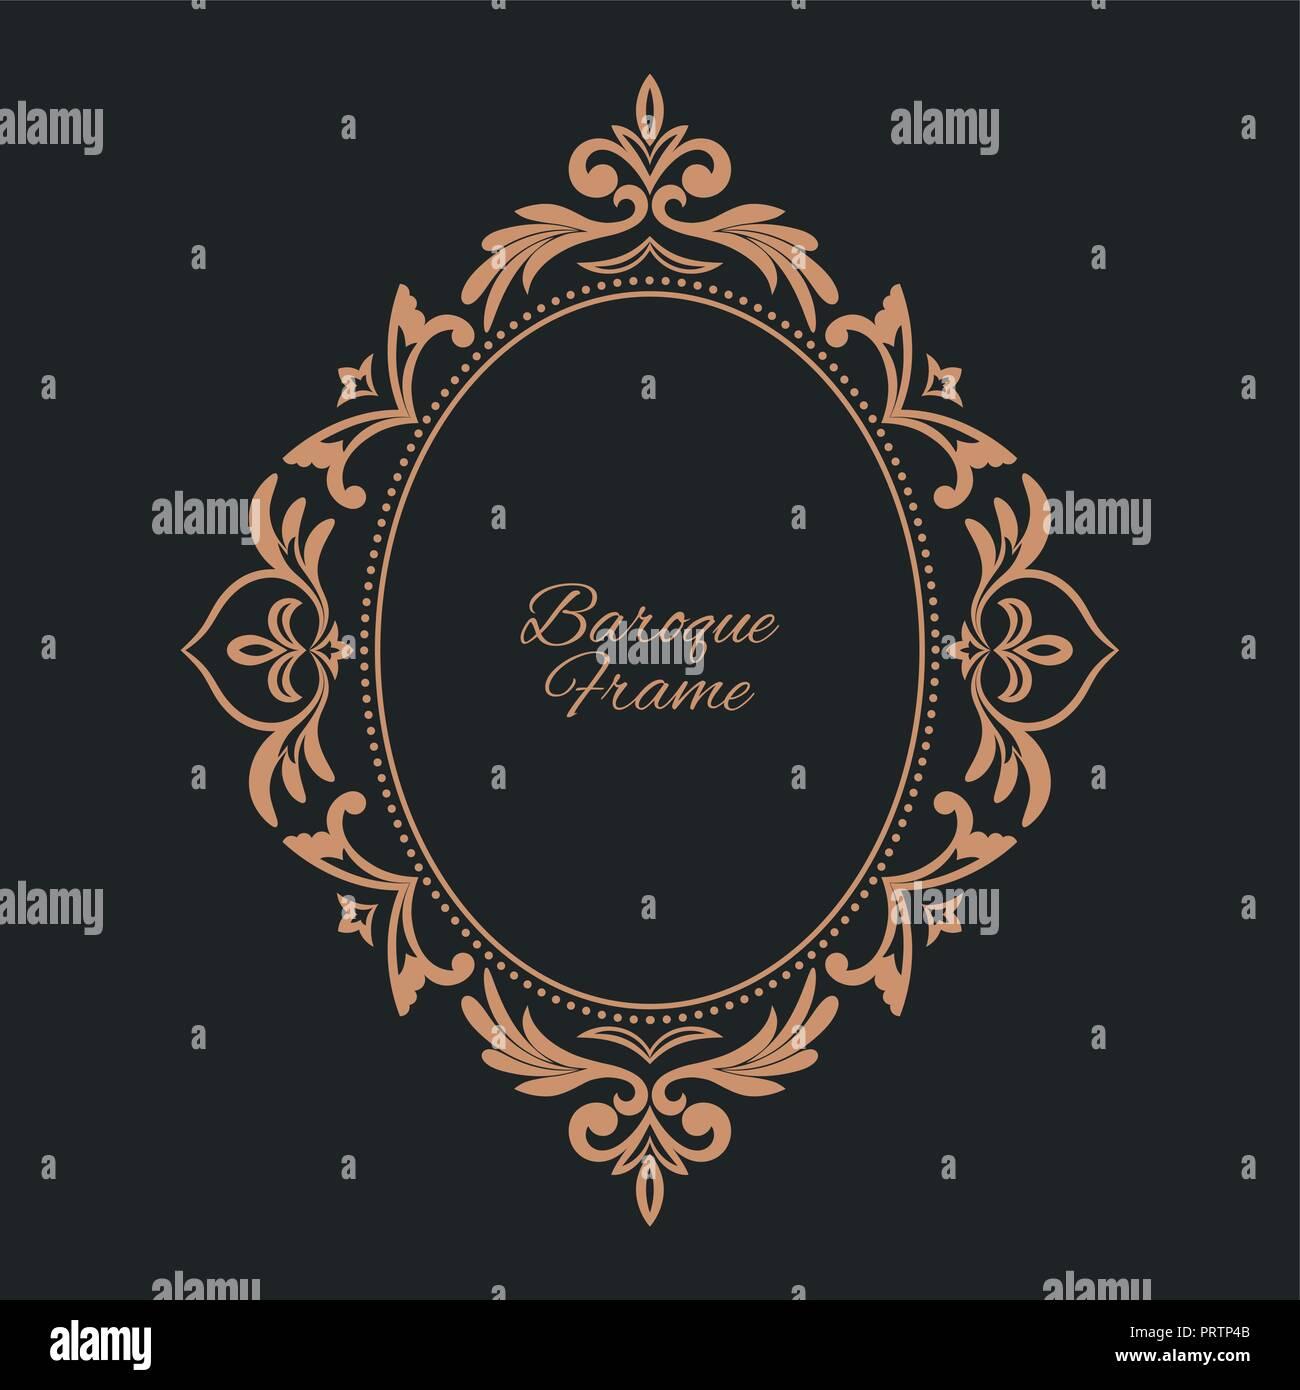 circular pattern round ornament vintage frame greeting card